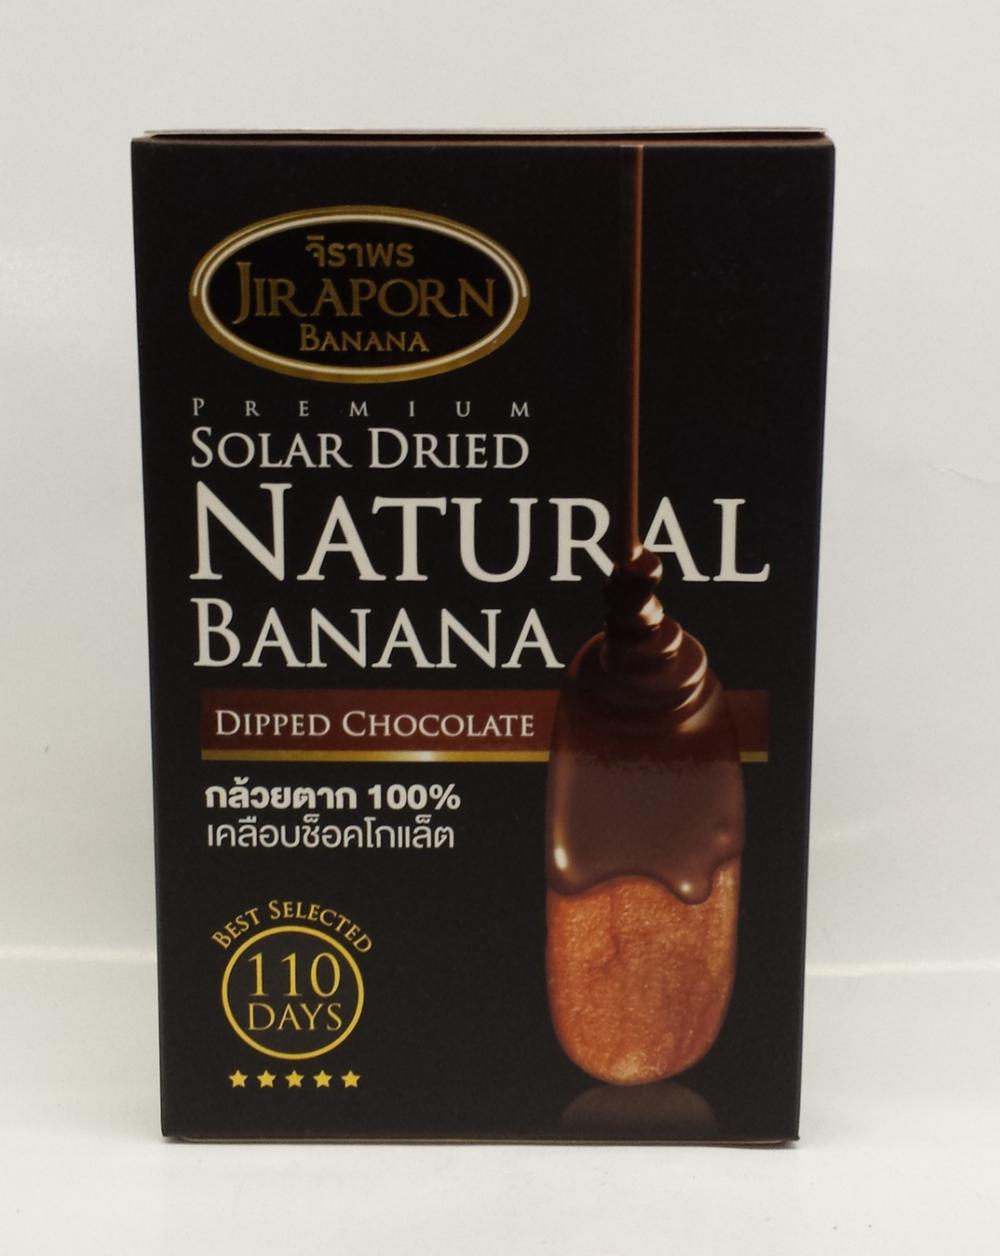 Dried Banana, Chocolate   Jiraporn   PS11006 20x15.75 oz